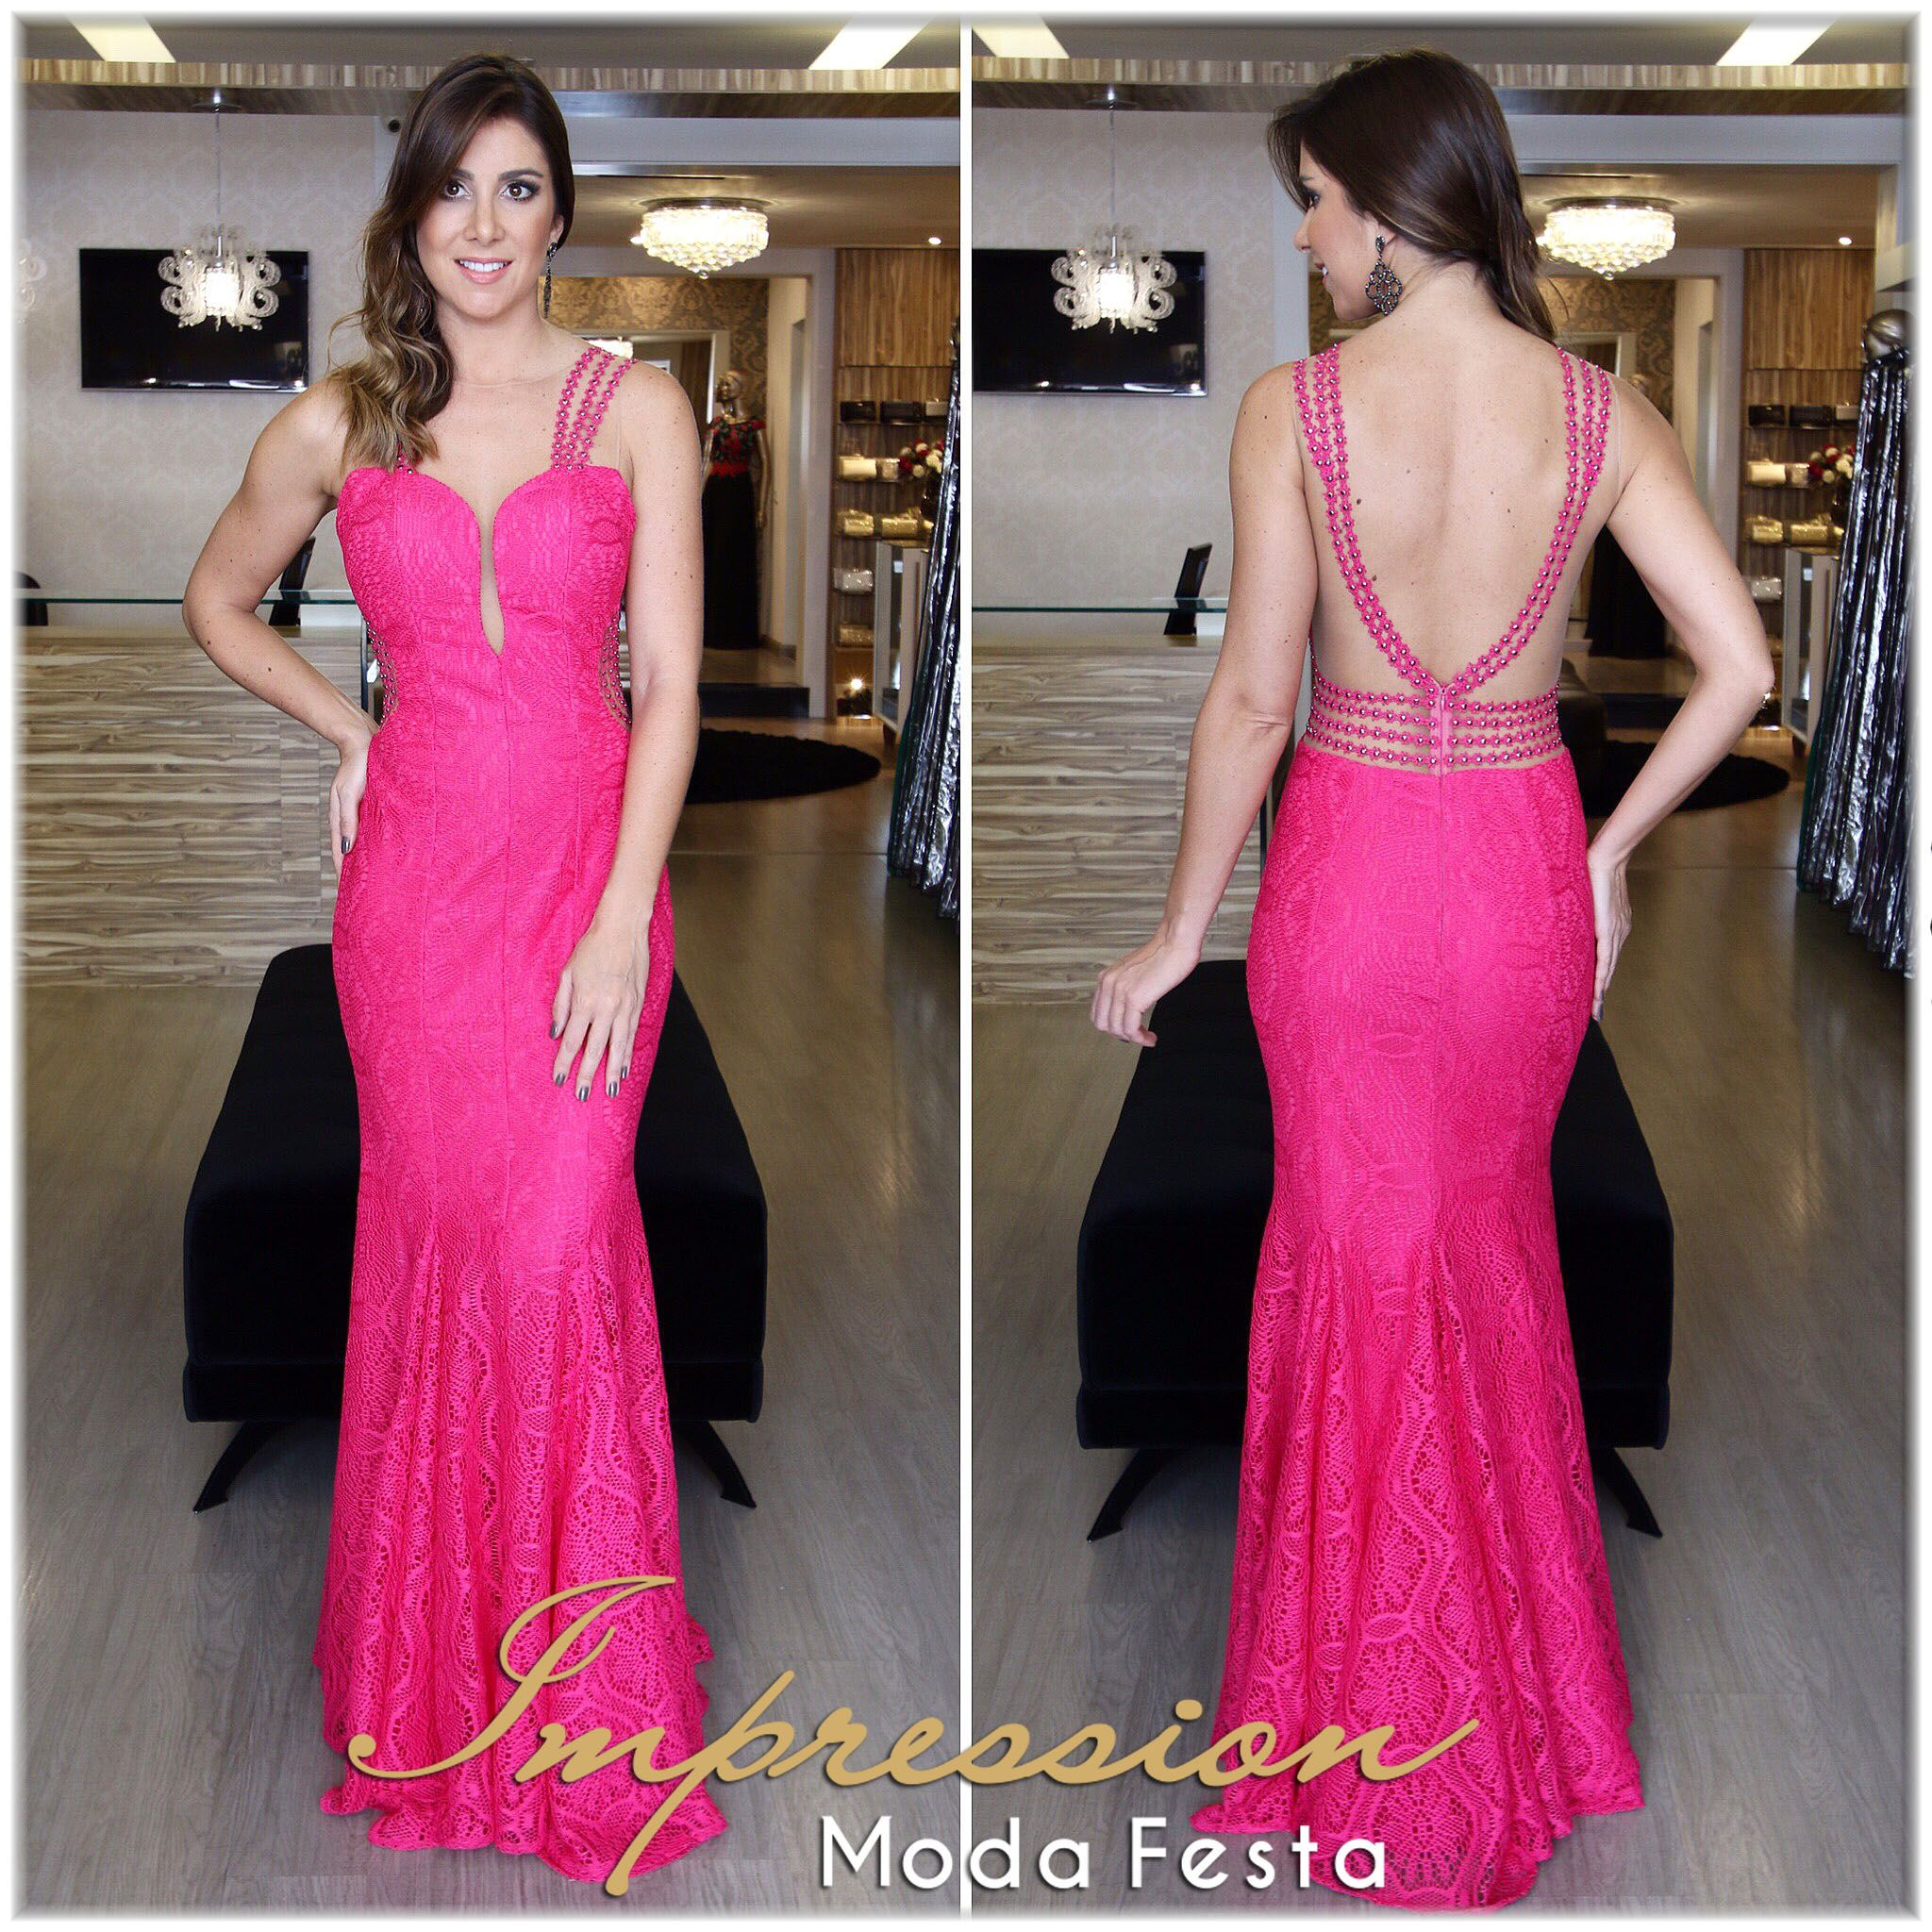 VESTIDO LONGO PINK SEREIA COM RECORTES E BORDADO DE FESTA | vestidos ...